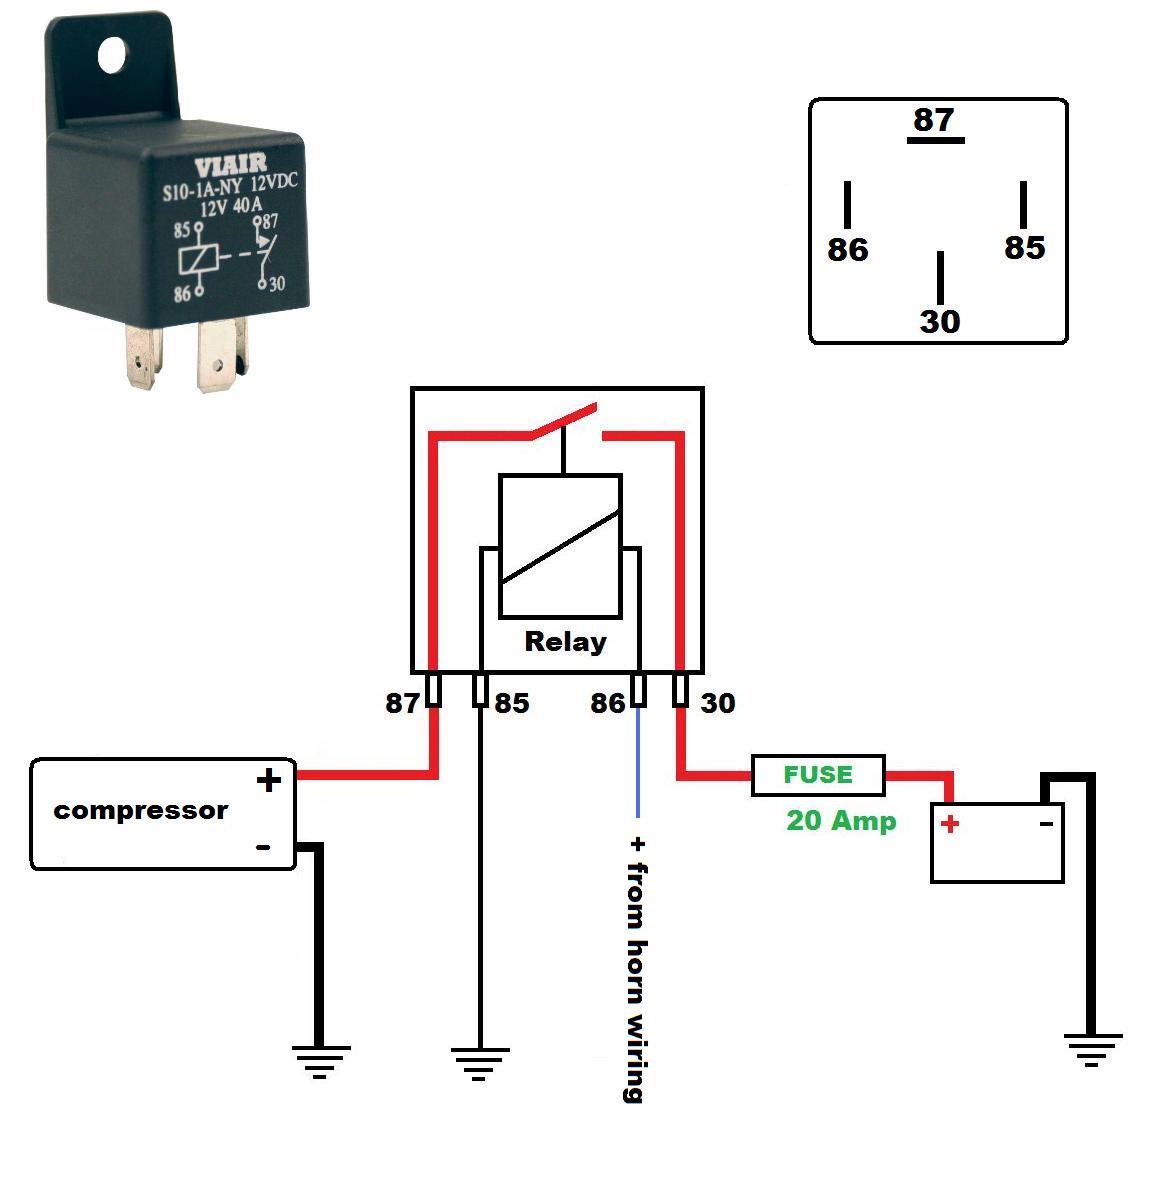 hight resolution of air horn installation diagram simple wiring diagram rh 40 mara cujas de air horn relay wiring